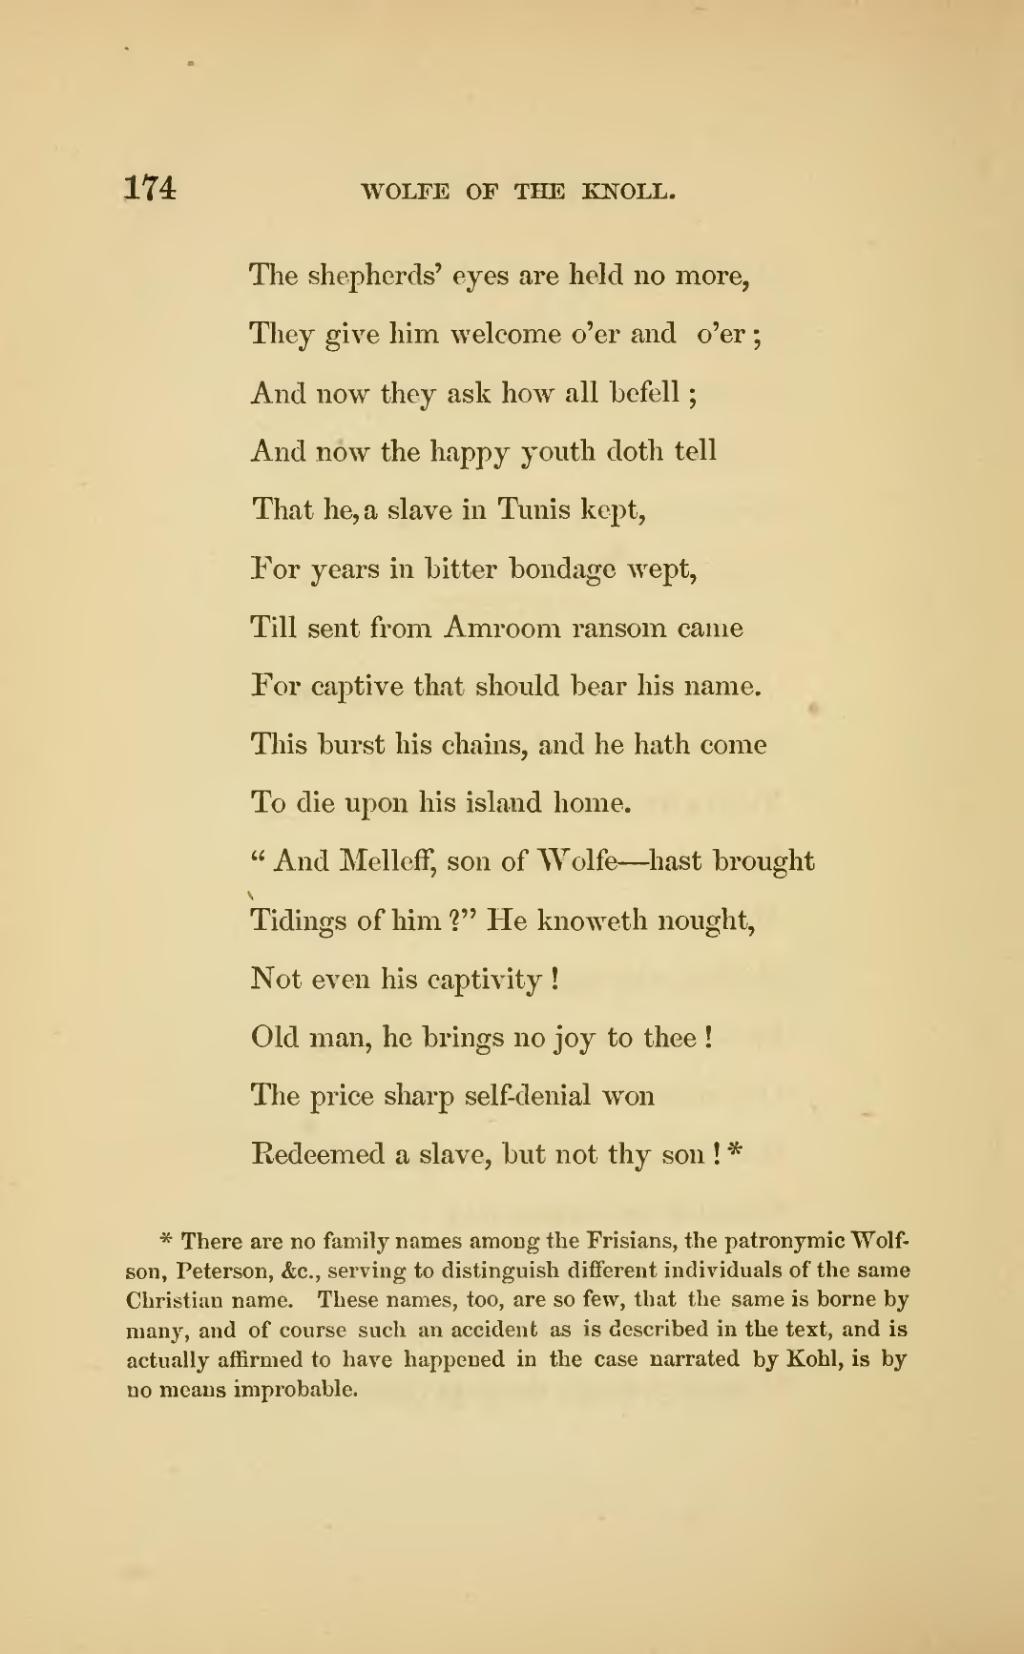 Seite:Marsh Wolfe of the knoll djvu/170 – Wikipedia